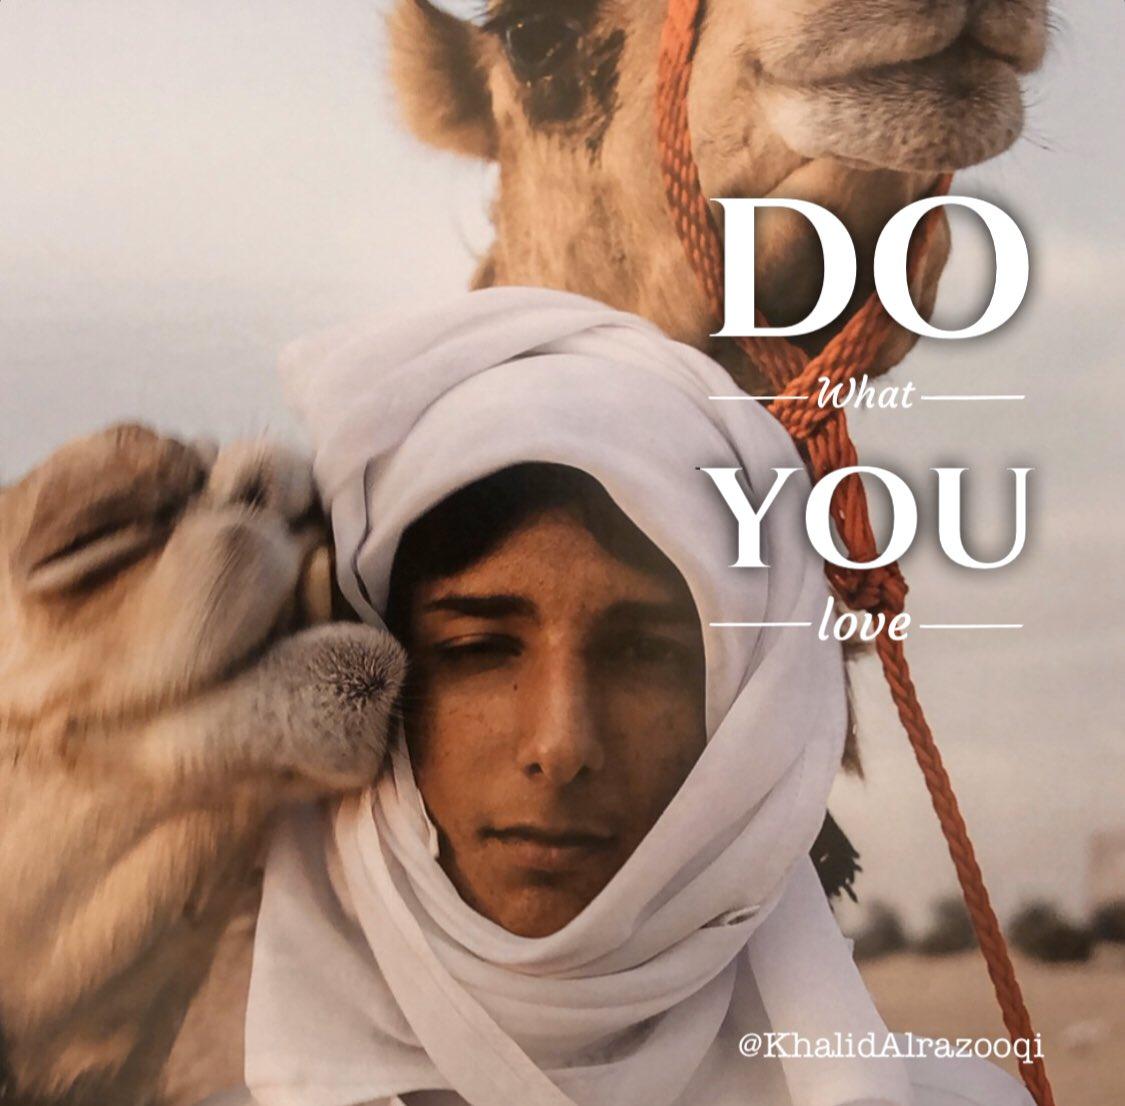 Do what you love    #Dubaj #mydubai  #uae #الامارات #دبي   #travelphotography #travel #explore #discover #photographypic.twitter.com/Qx3y9H5jc9